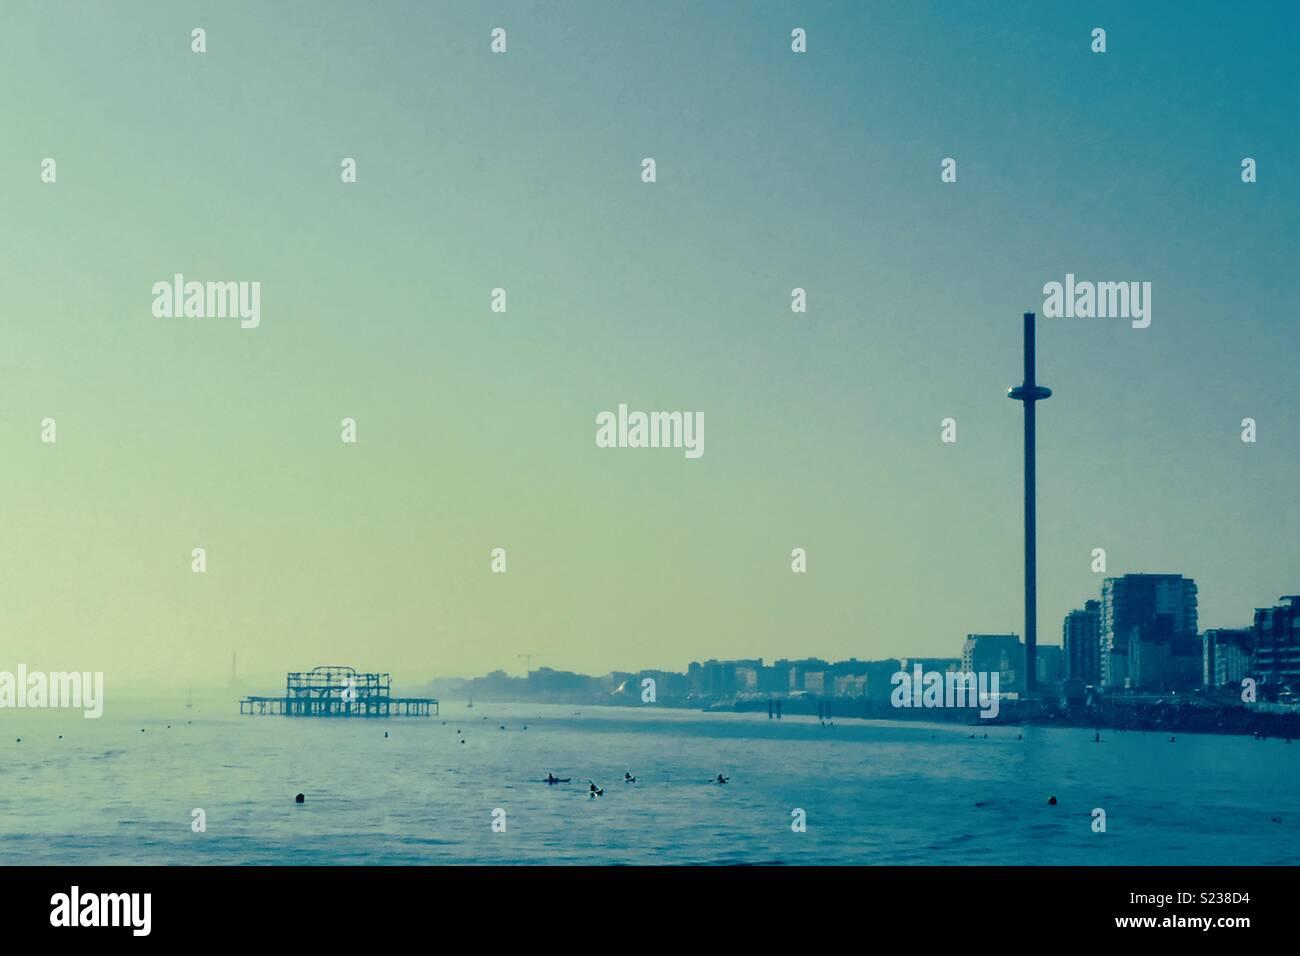 Brighton i360 and Old Brighton Pier blue sea and sky - Stock Image